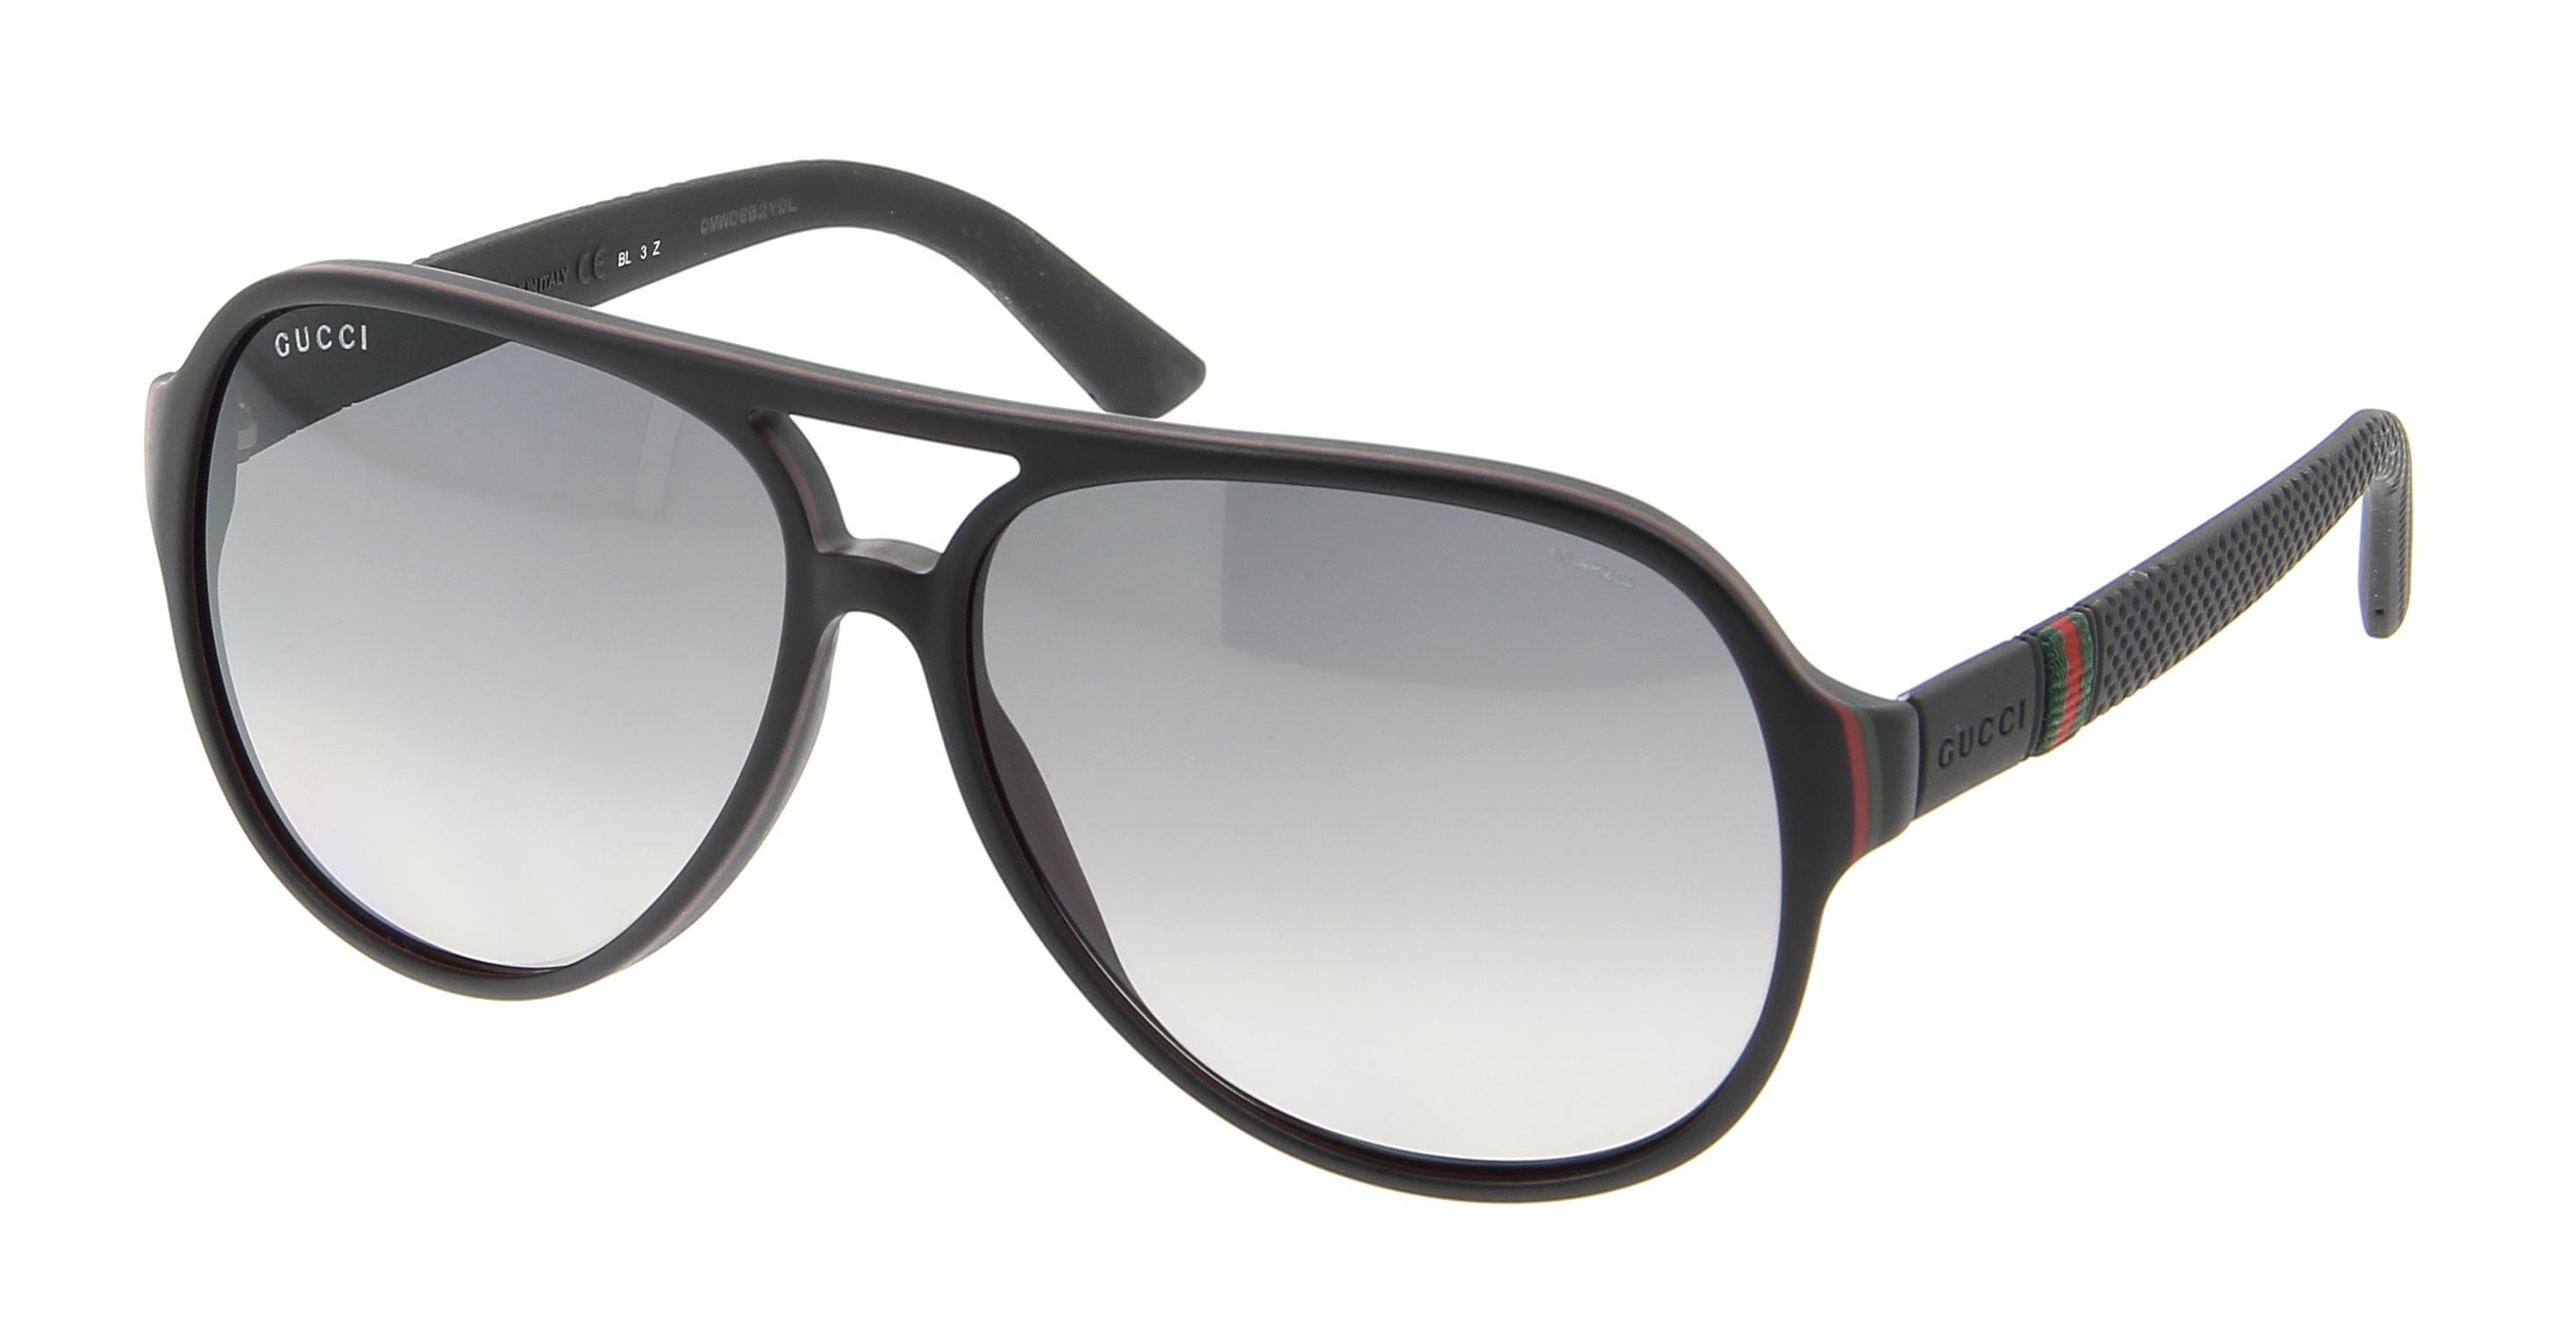 Gucci Full Frame Glasses : Sunglasses GUCCI GG 1065/S 4UP 59/13 Man noir Aviator ...